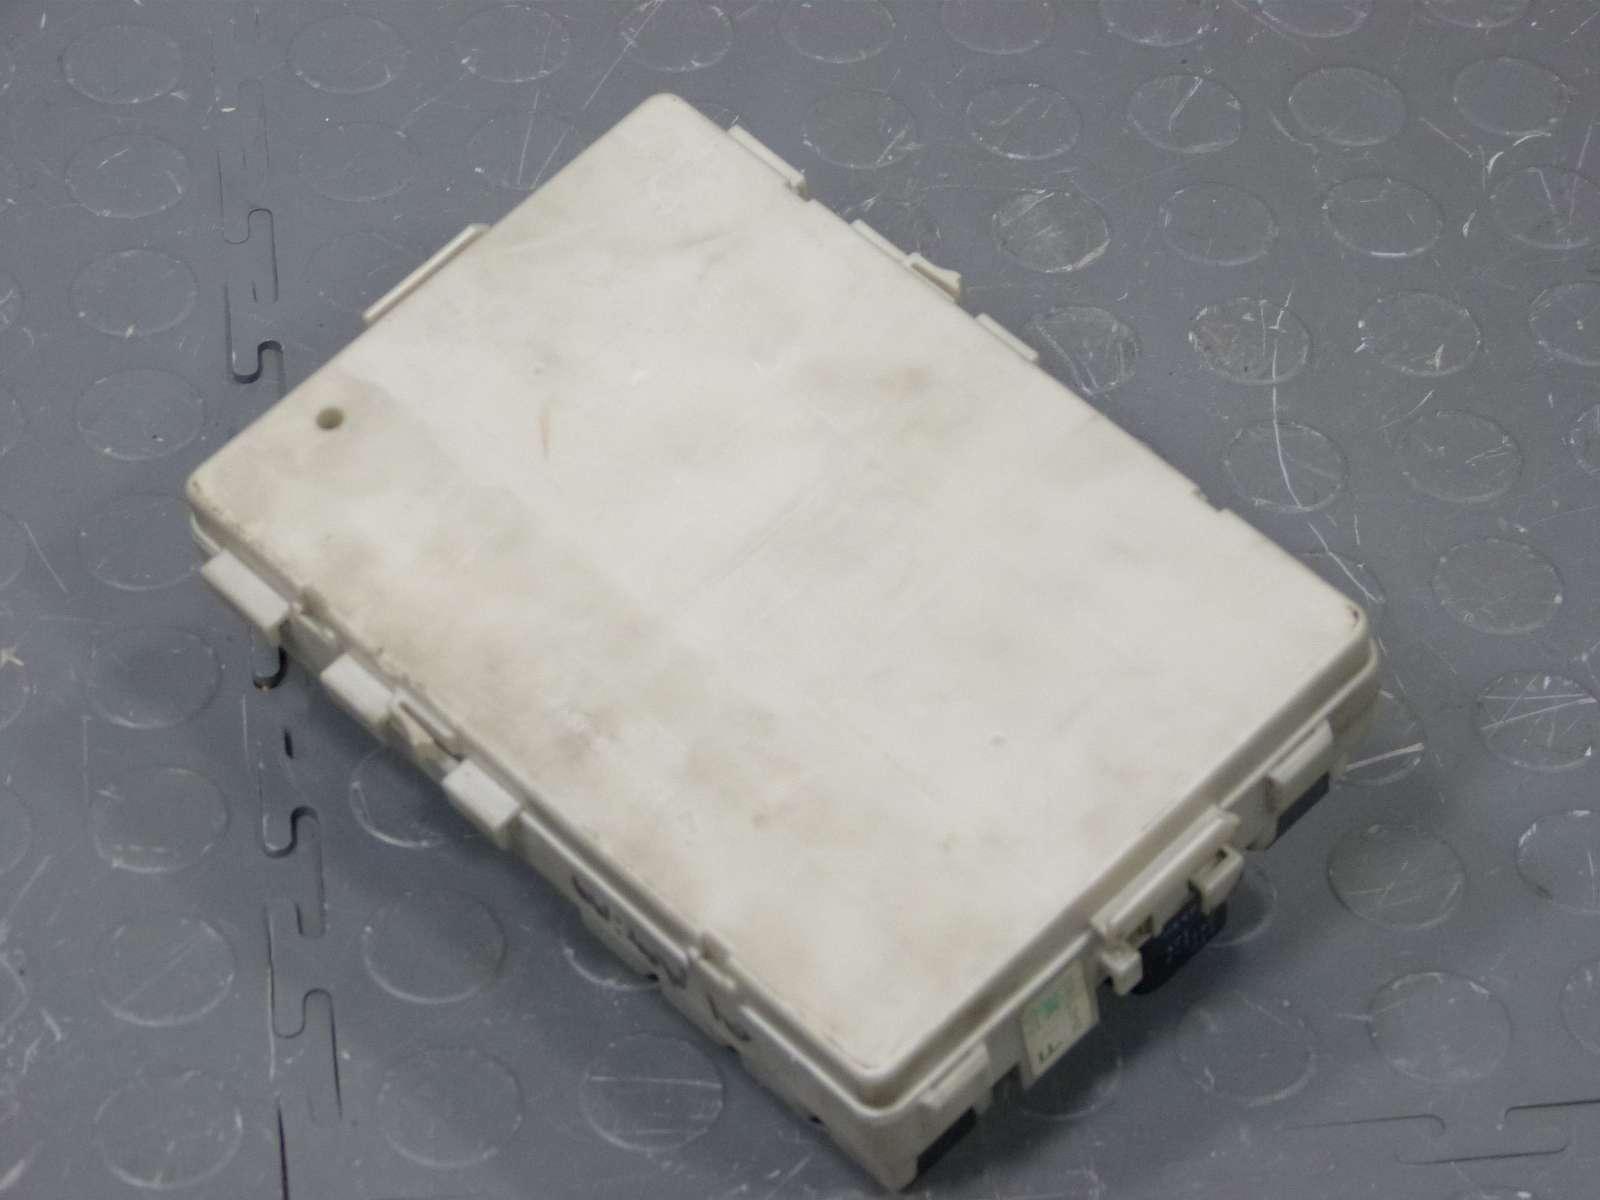 04 06 nissan maxima ipdm bcm body control module underhood